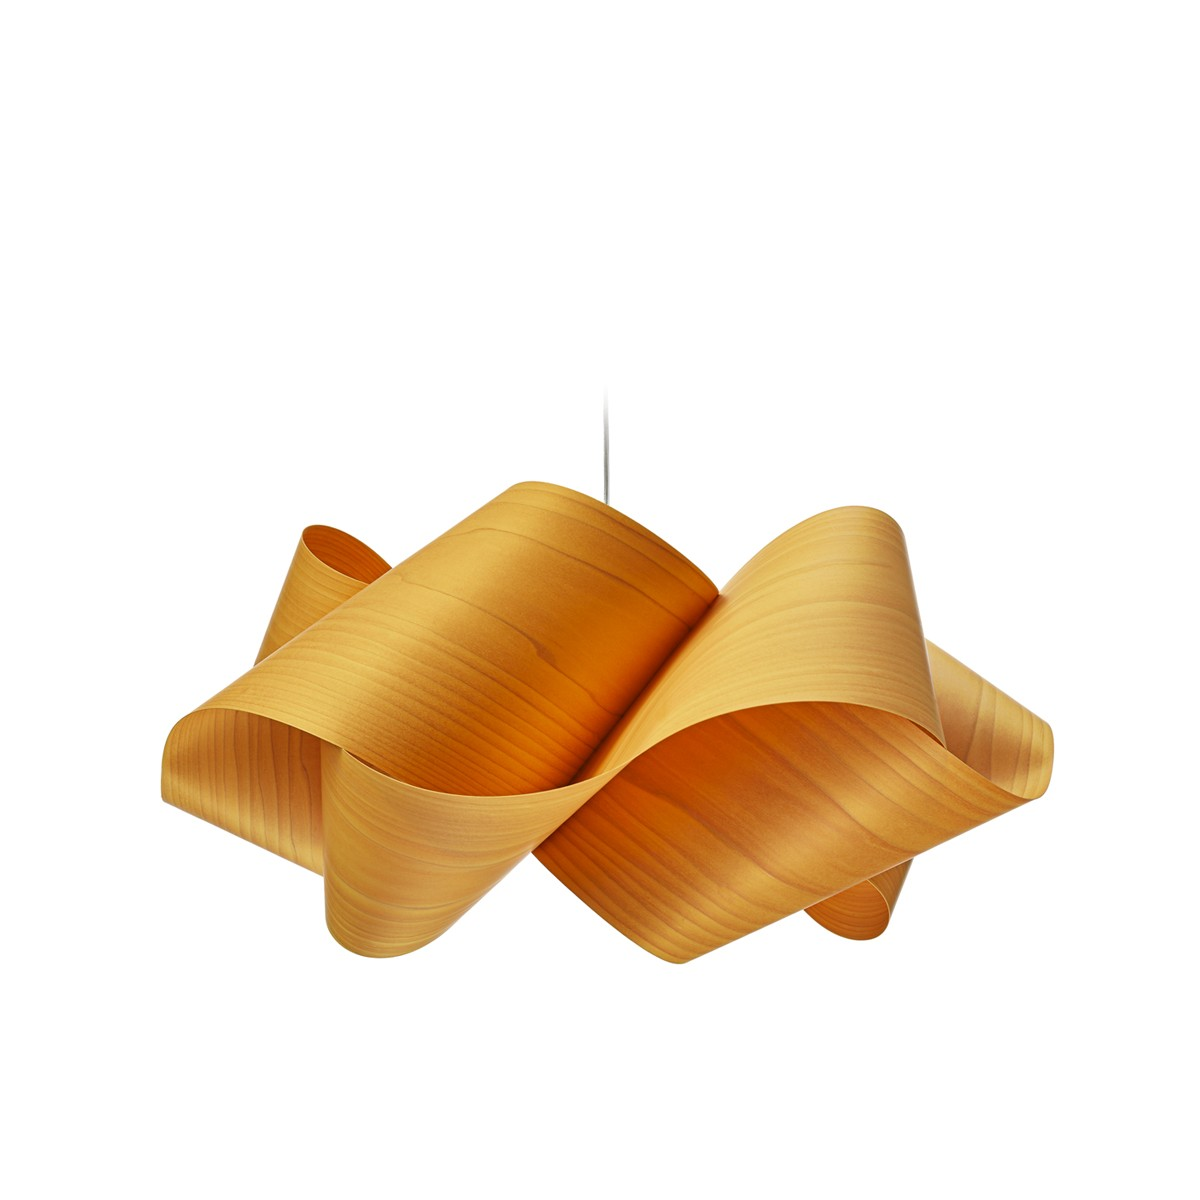 LZF Lamps Swirl Small Pendelleuchte, gelb